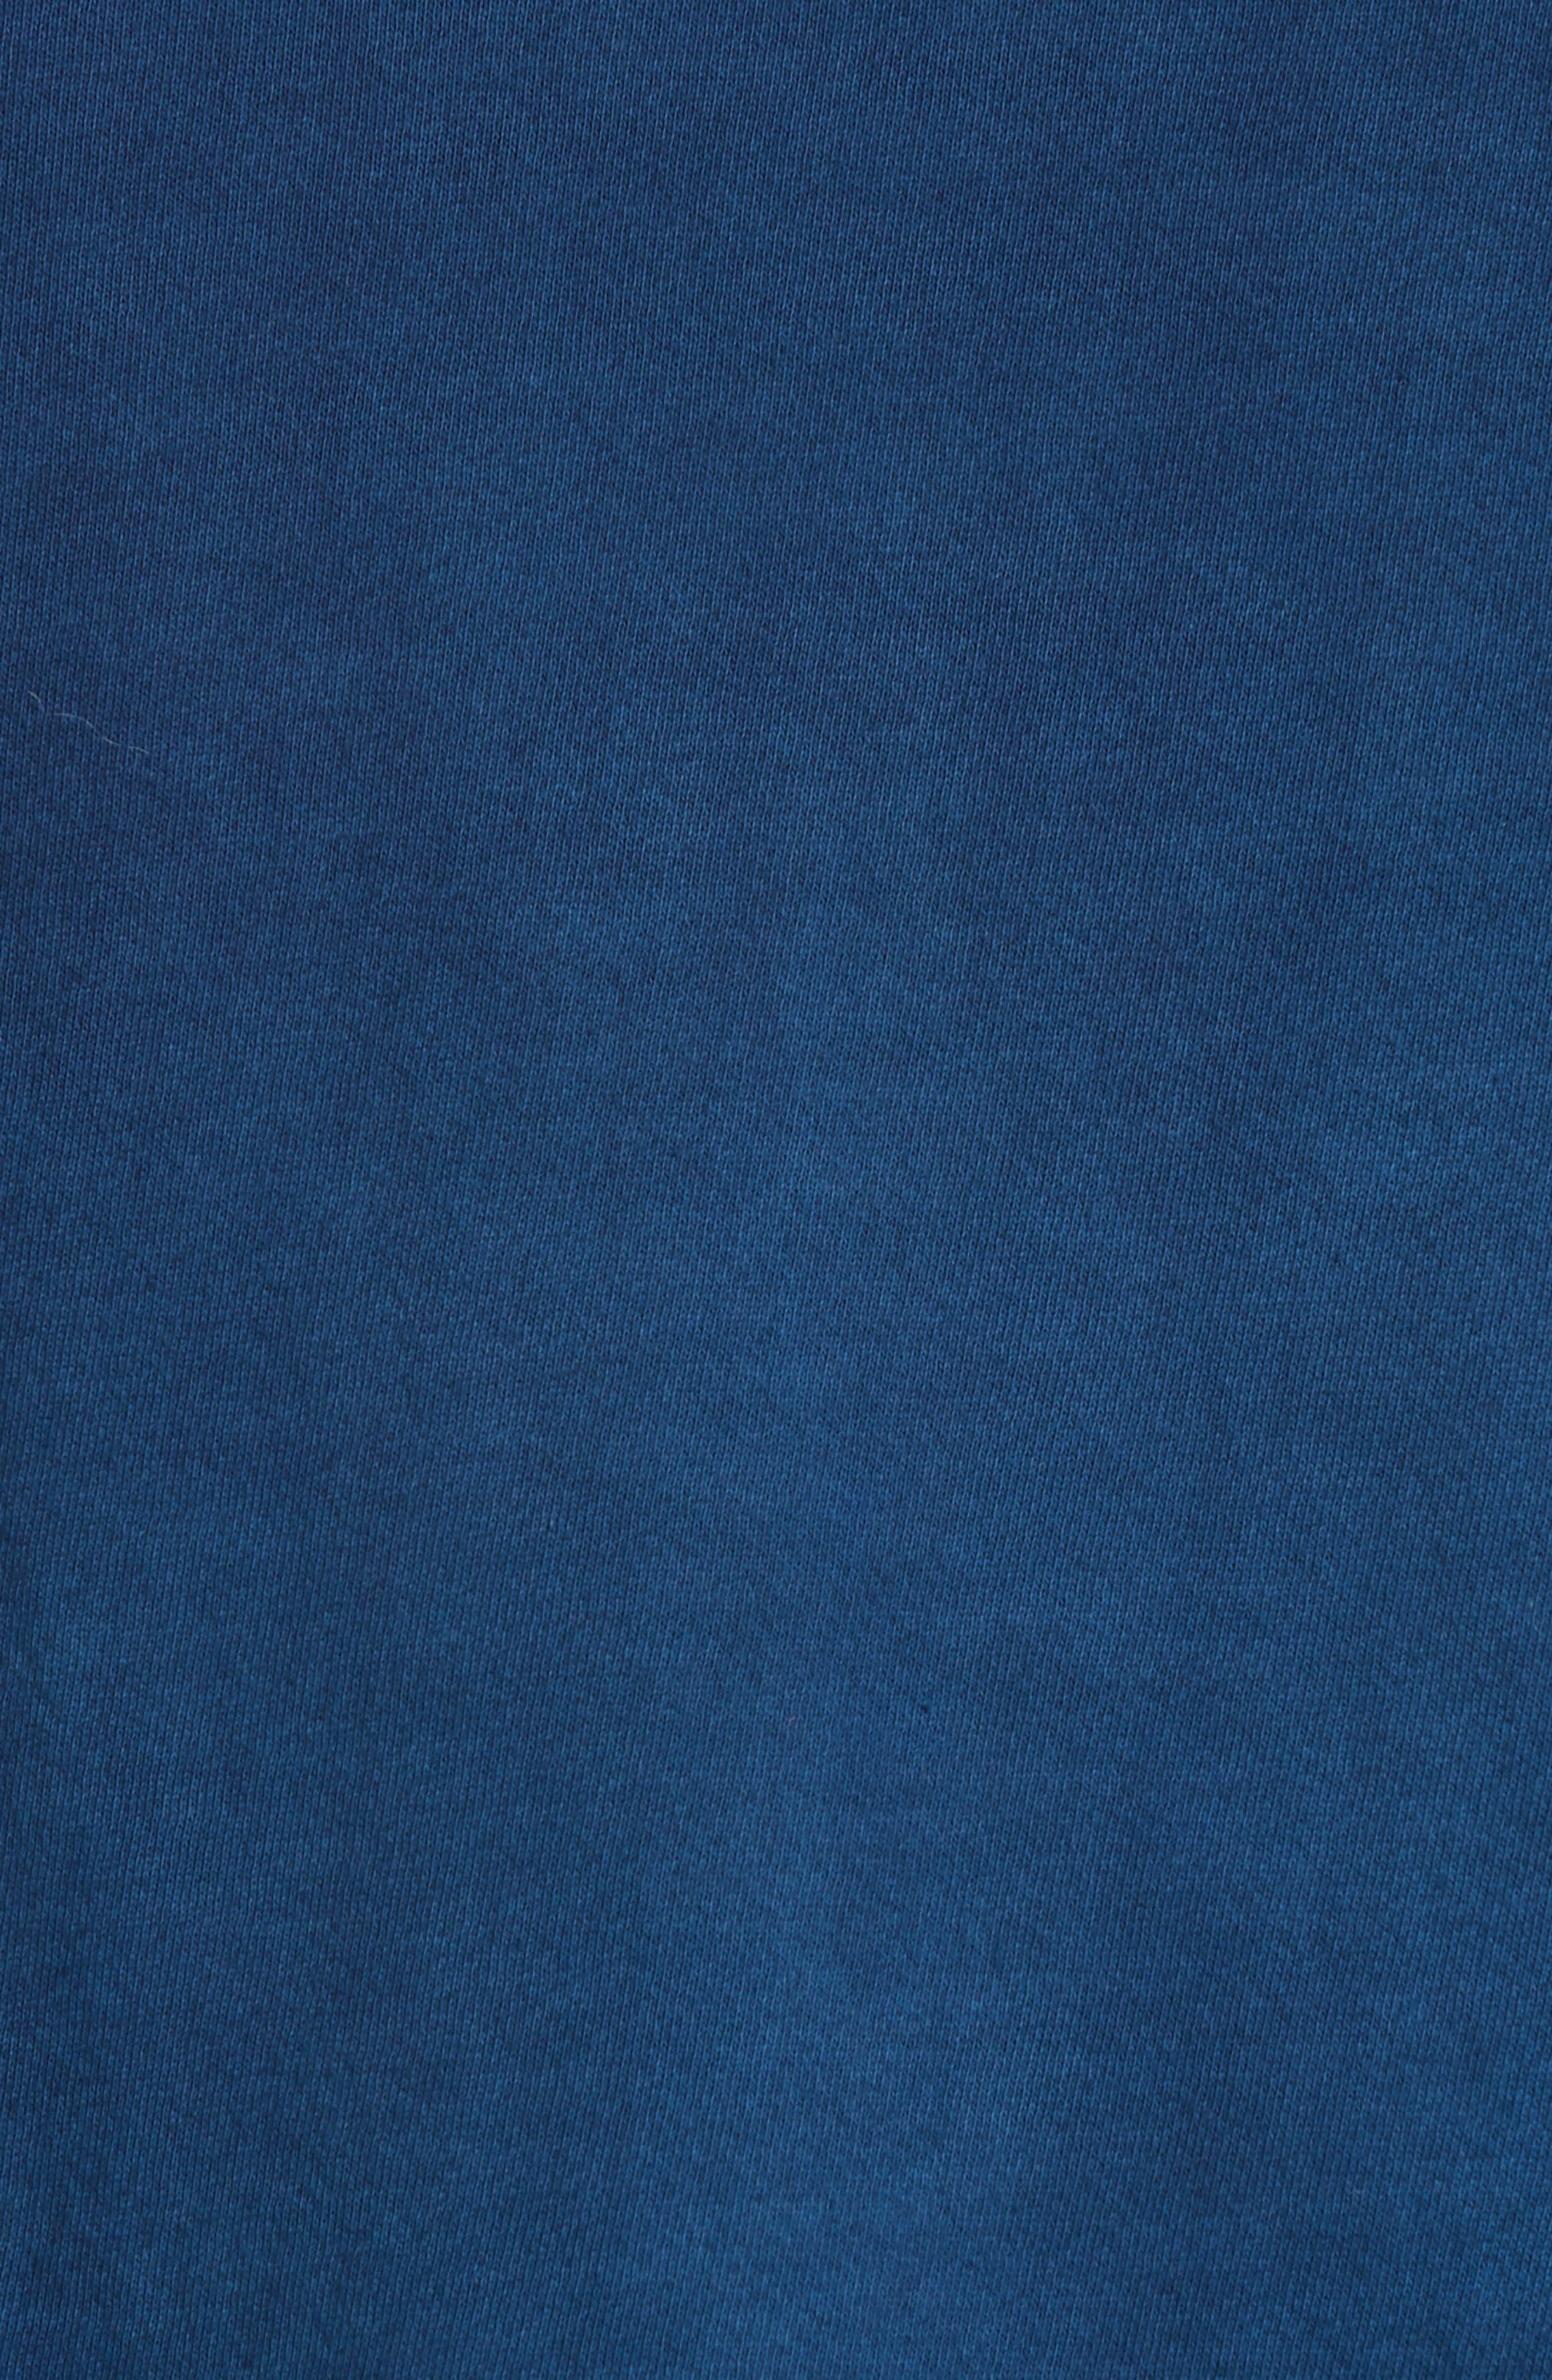 Malibu Reversible Sweatshirt,                             Alternate thumbnail 6, color,                             Indigo